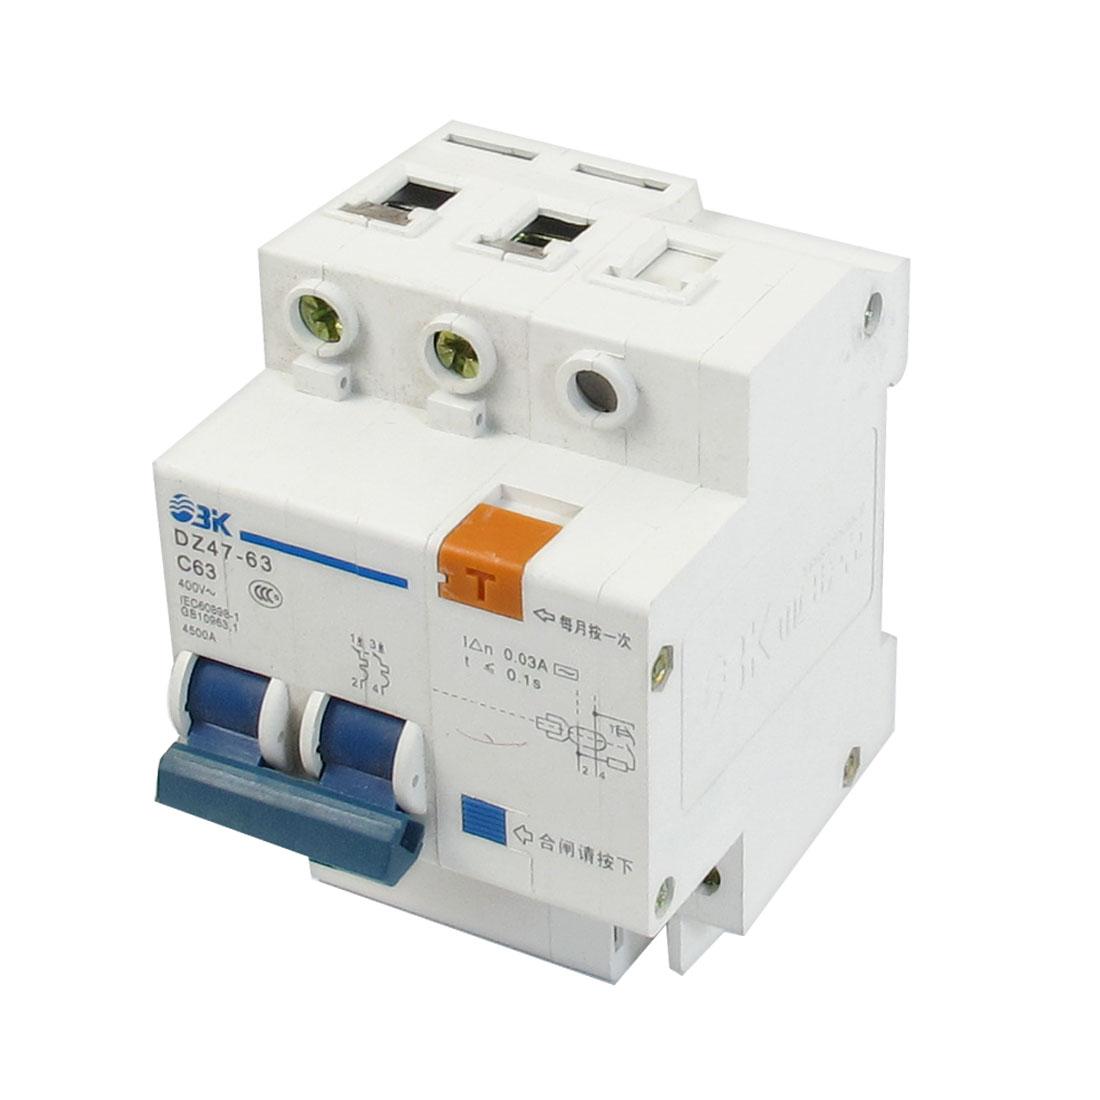 AC 400V 63A 4500A Breaking Capacity DIN Rail 2P+N Earth Leakage Circuit Breaker